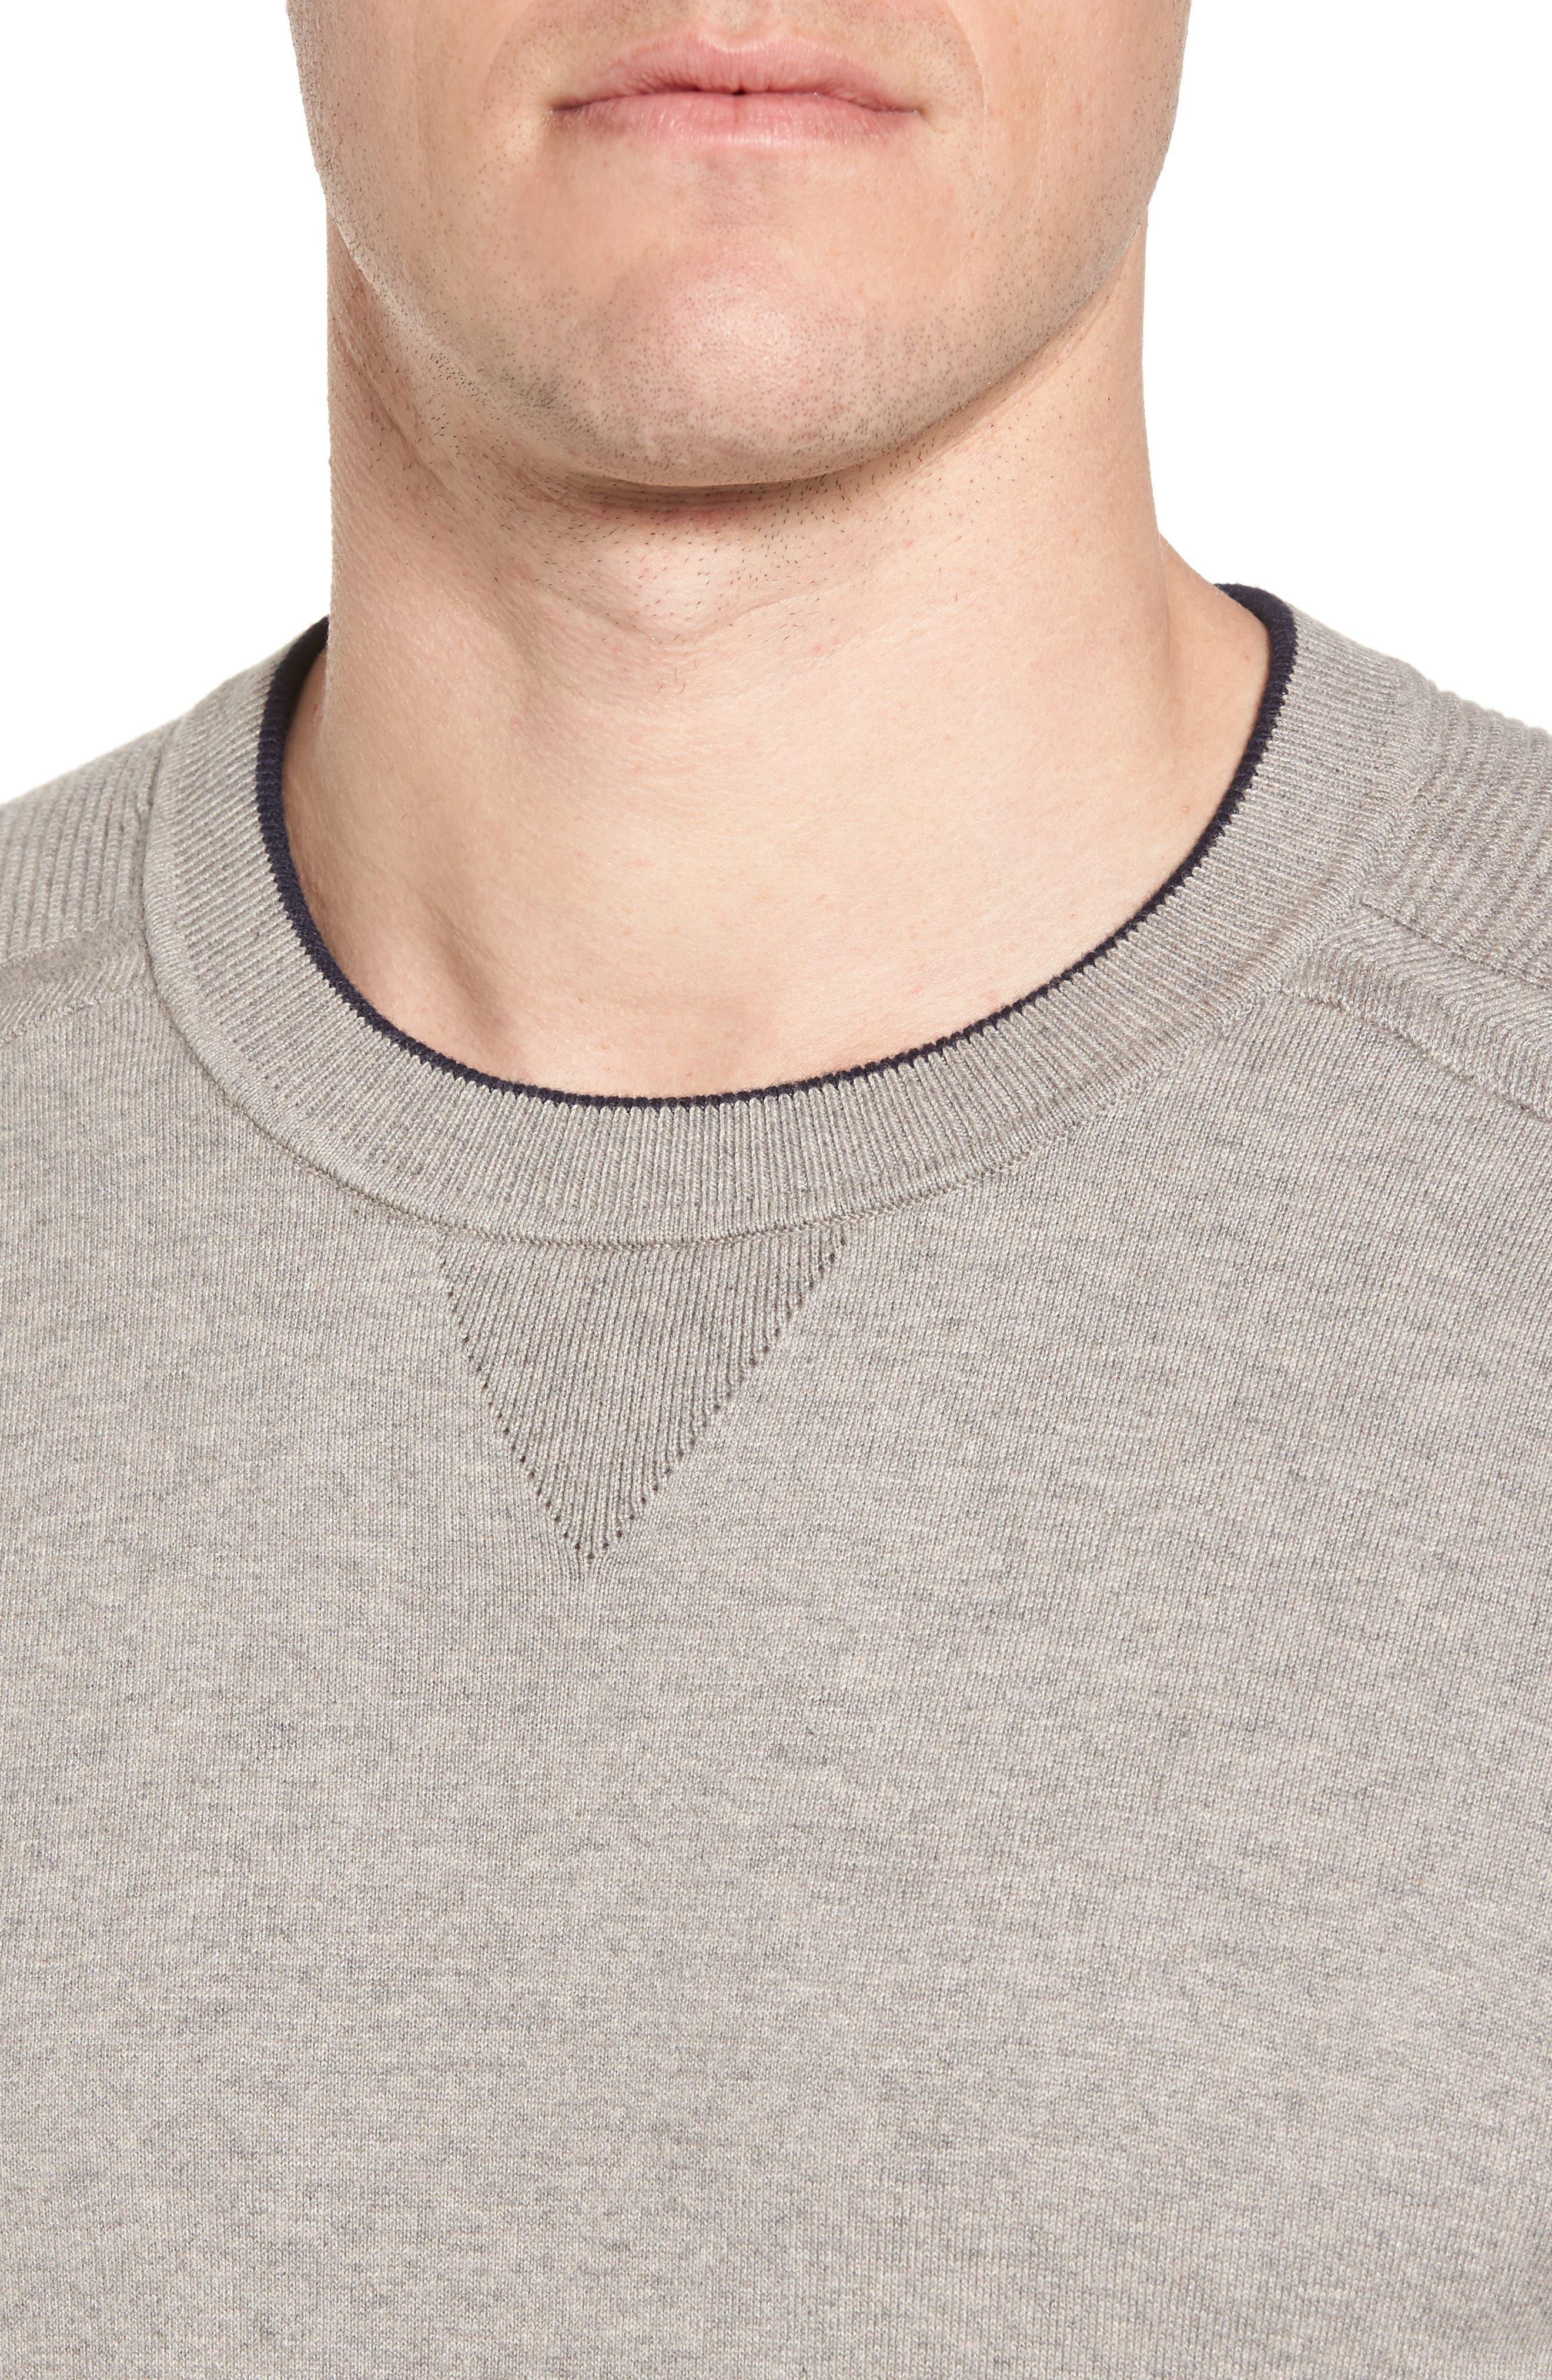 Kayfed Rib Sleeve Sweater,                             Alternate thumbnail 4, color,                             Grey Marl